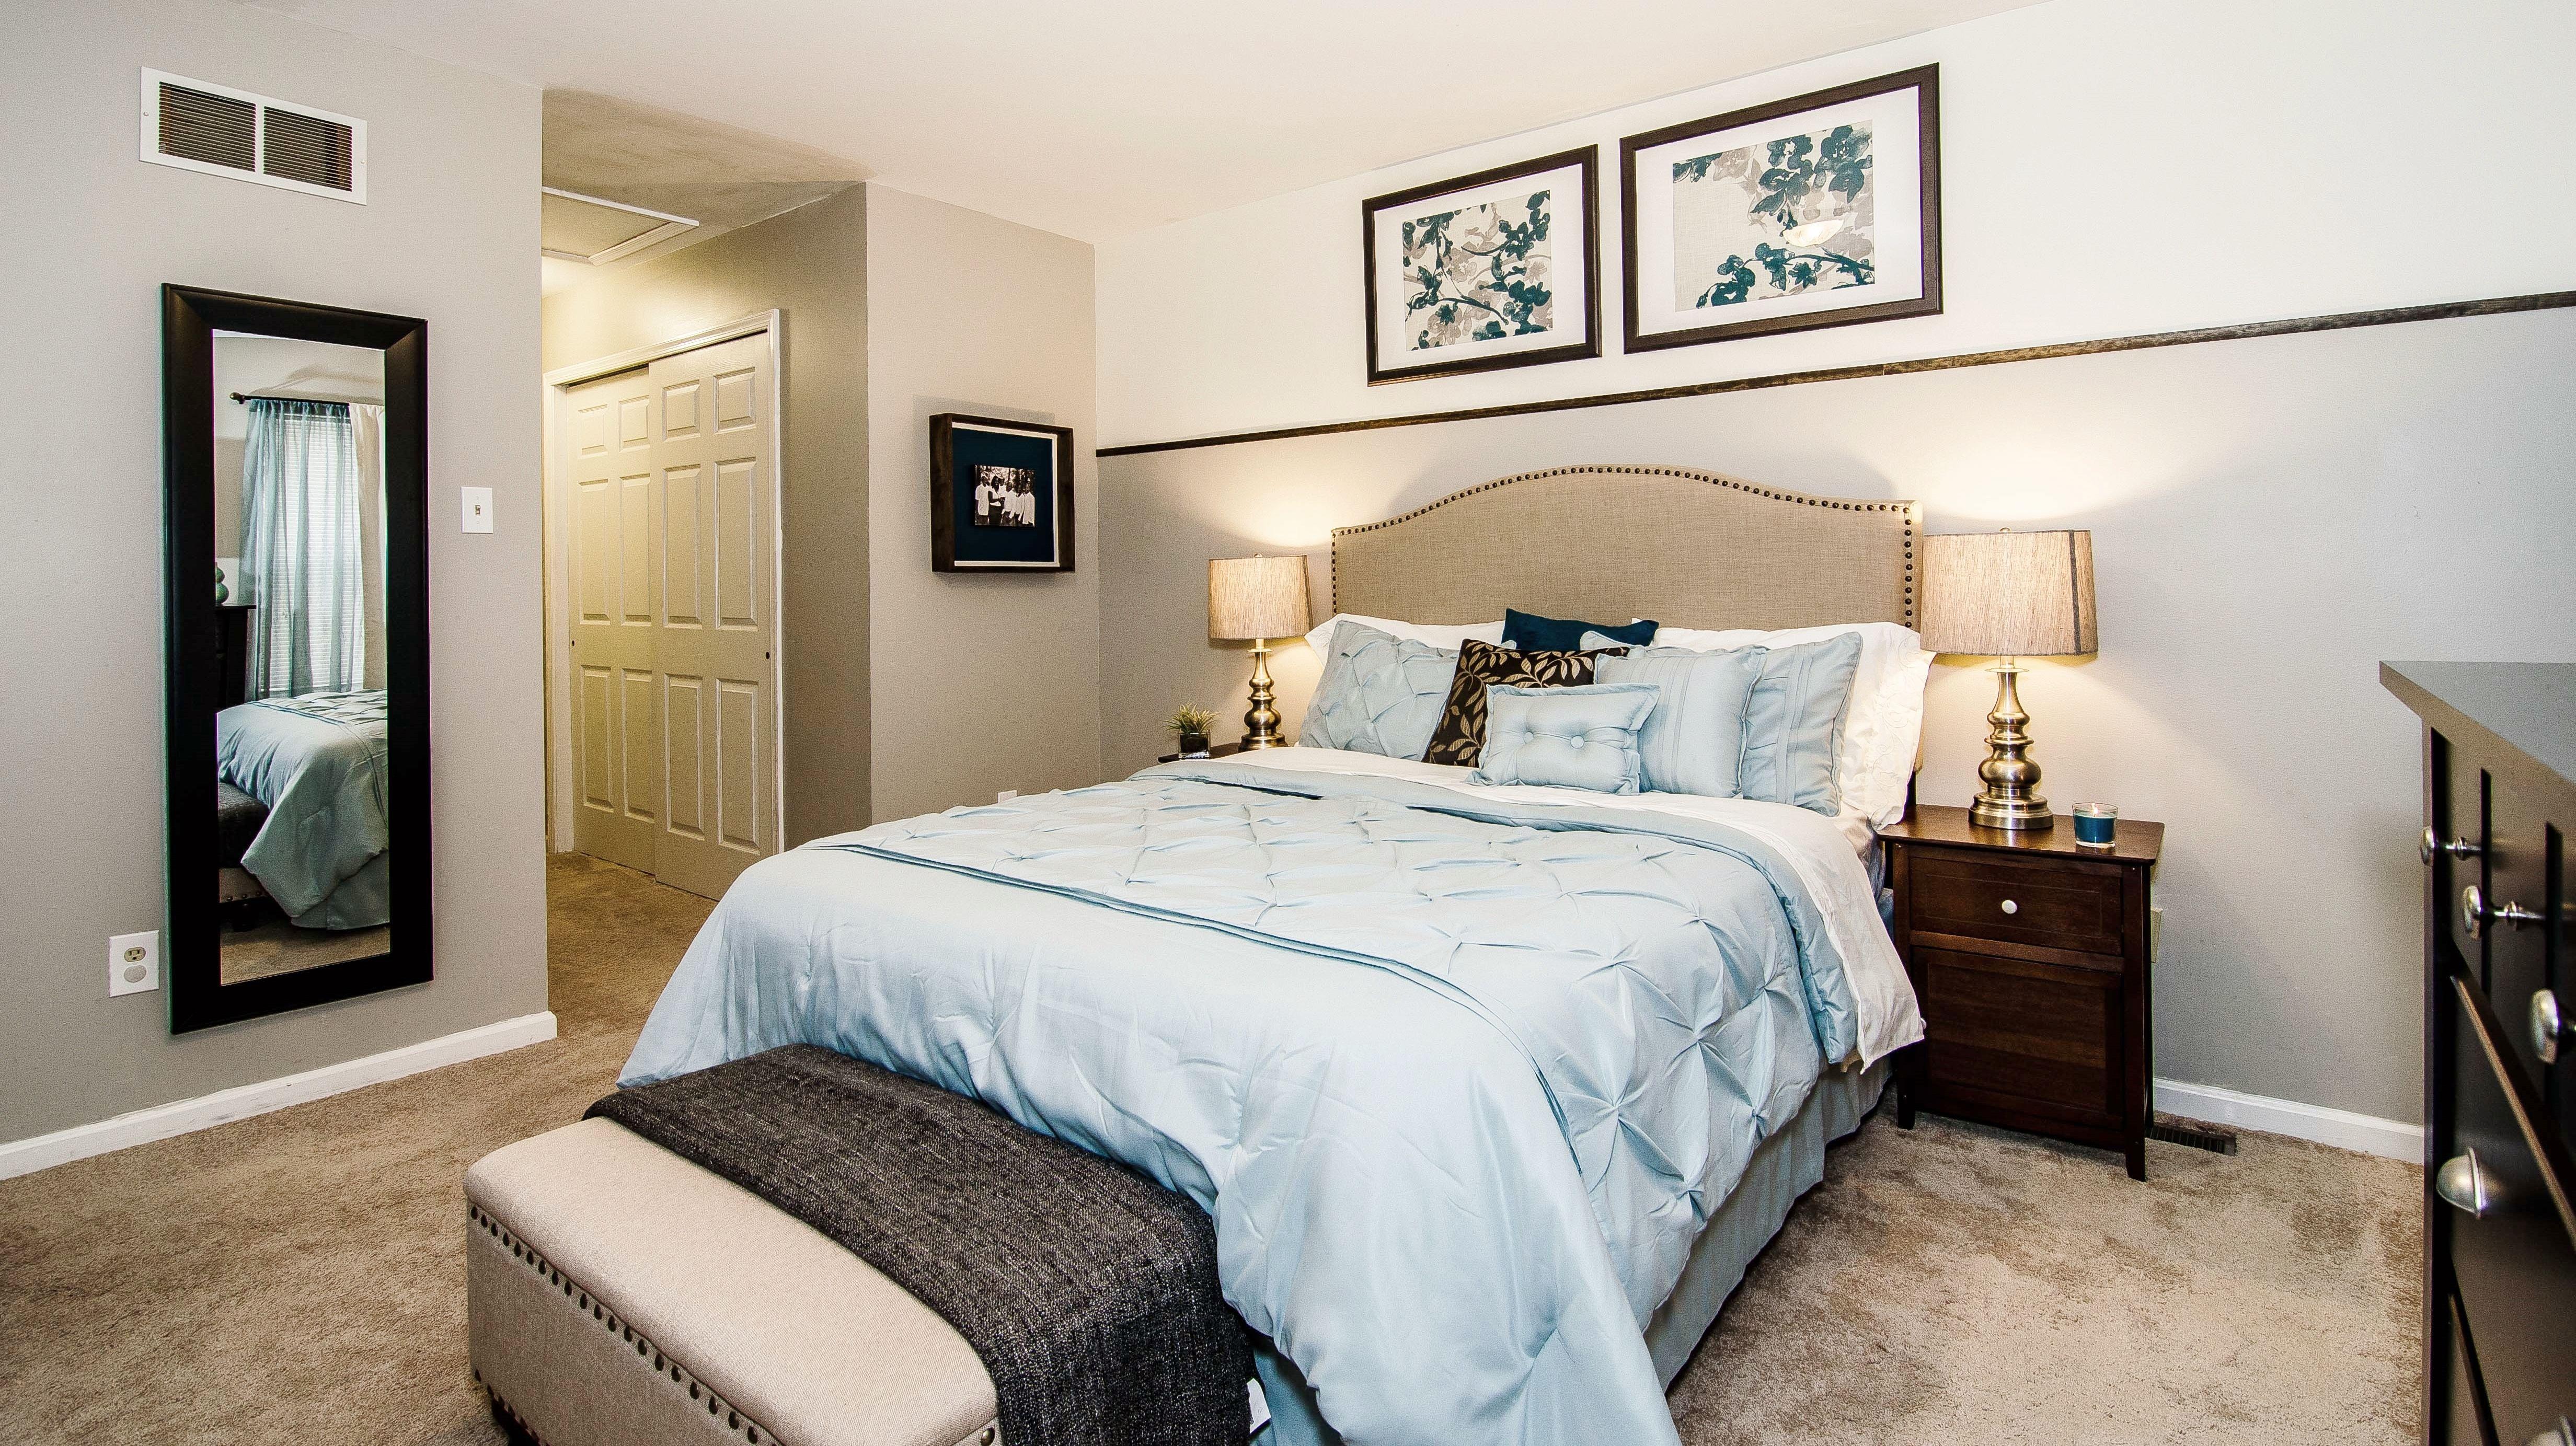 Master bedroom decor  relaxing soft color palette in master bedroom makeover  Decor for